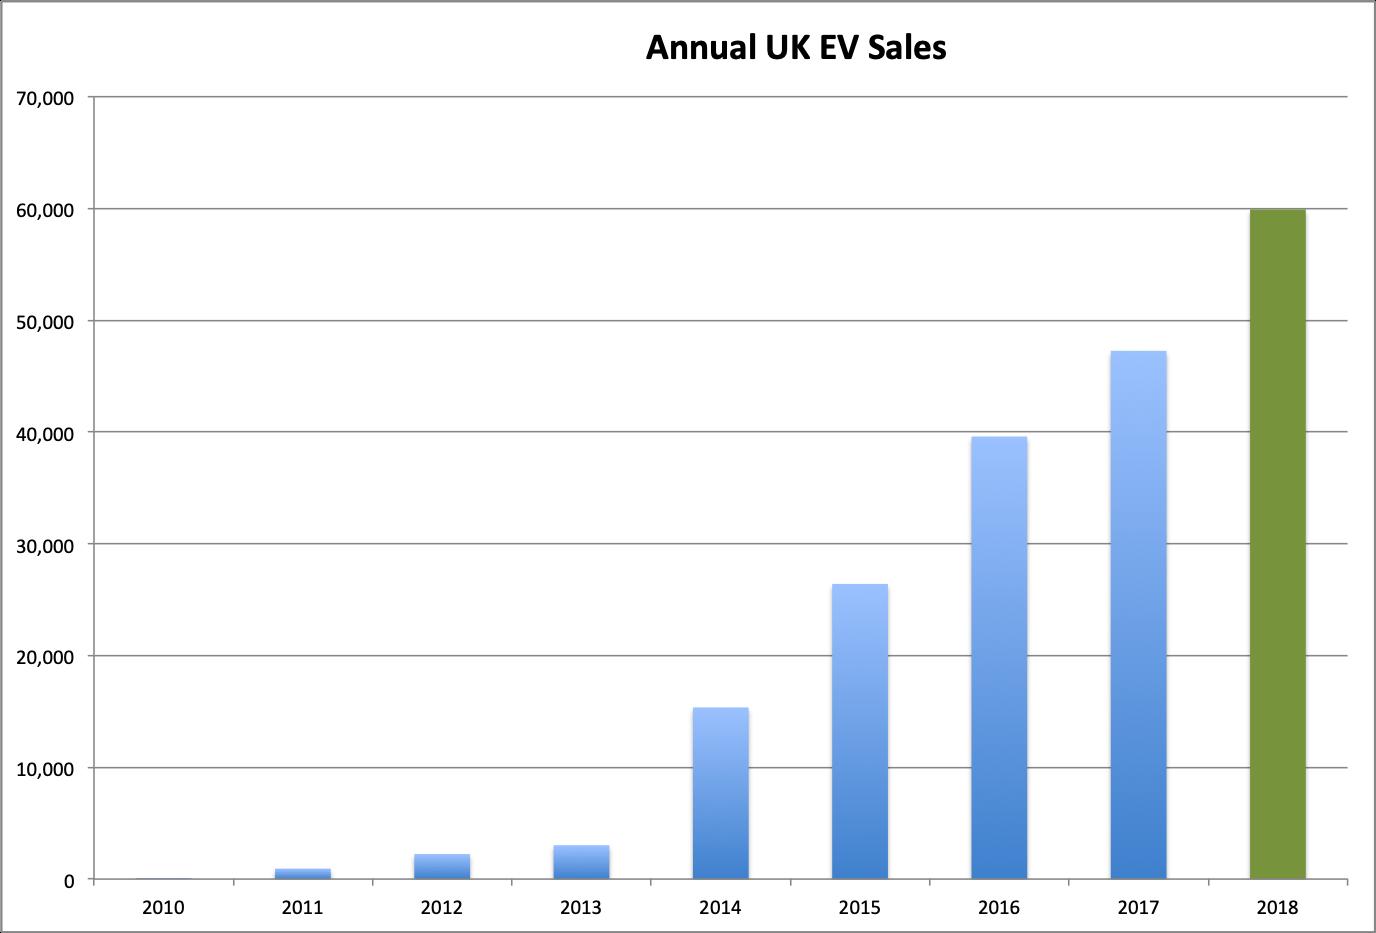 UK-EV-Sales history december 2018 ytd